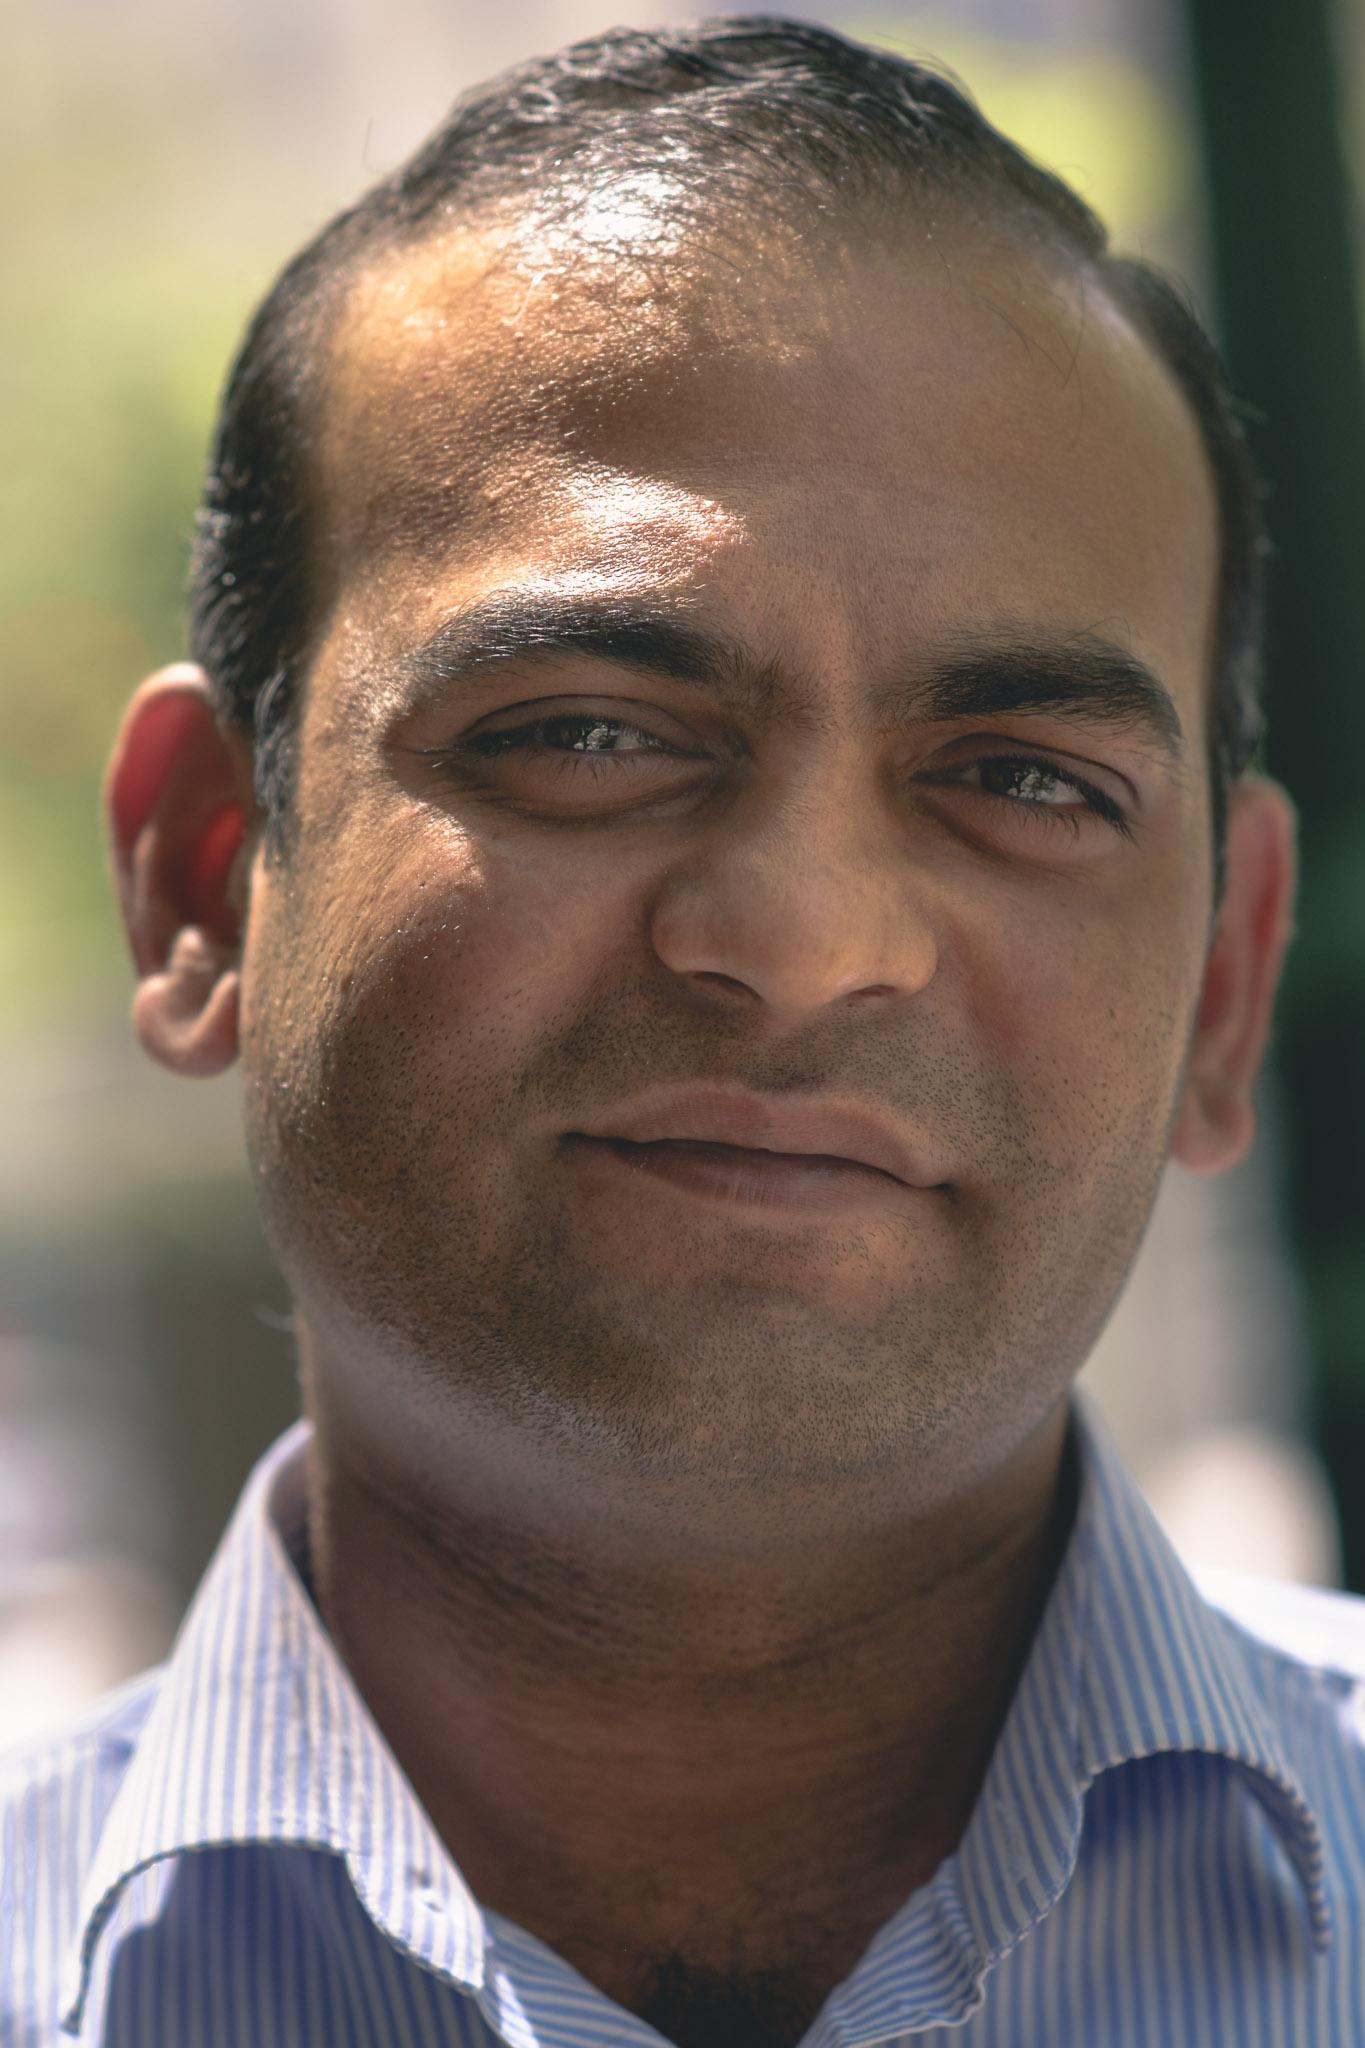 Meet Bhavin Patel